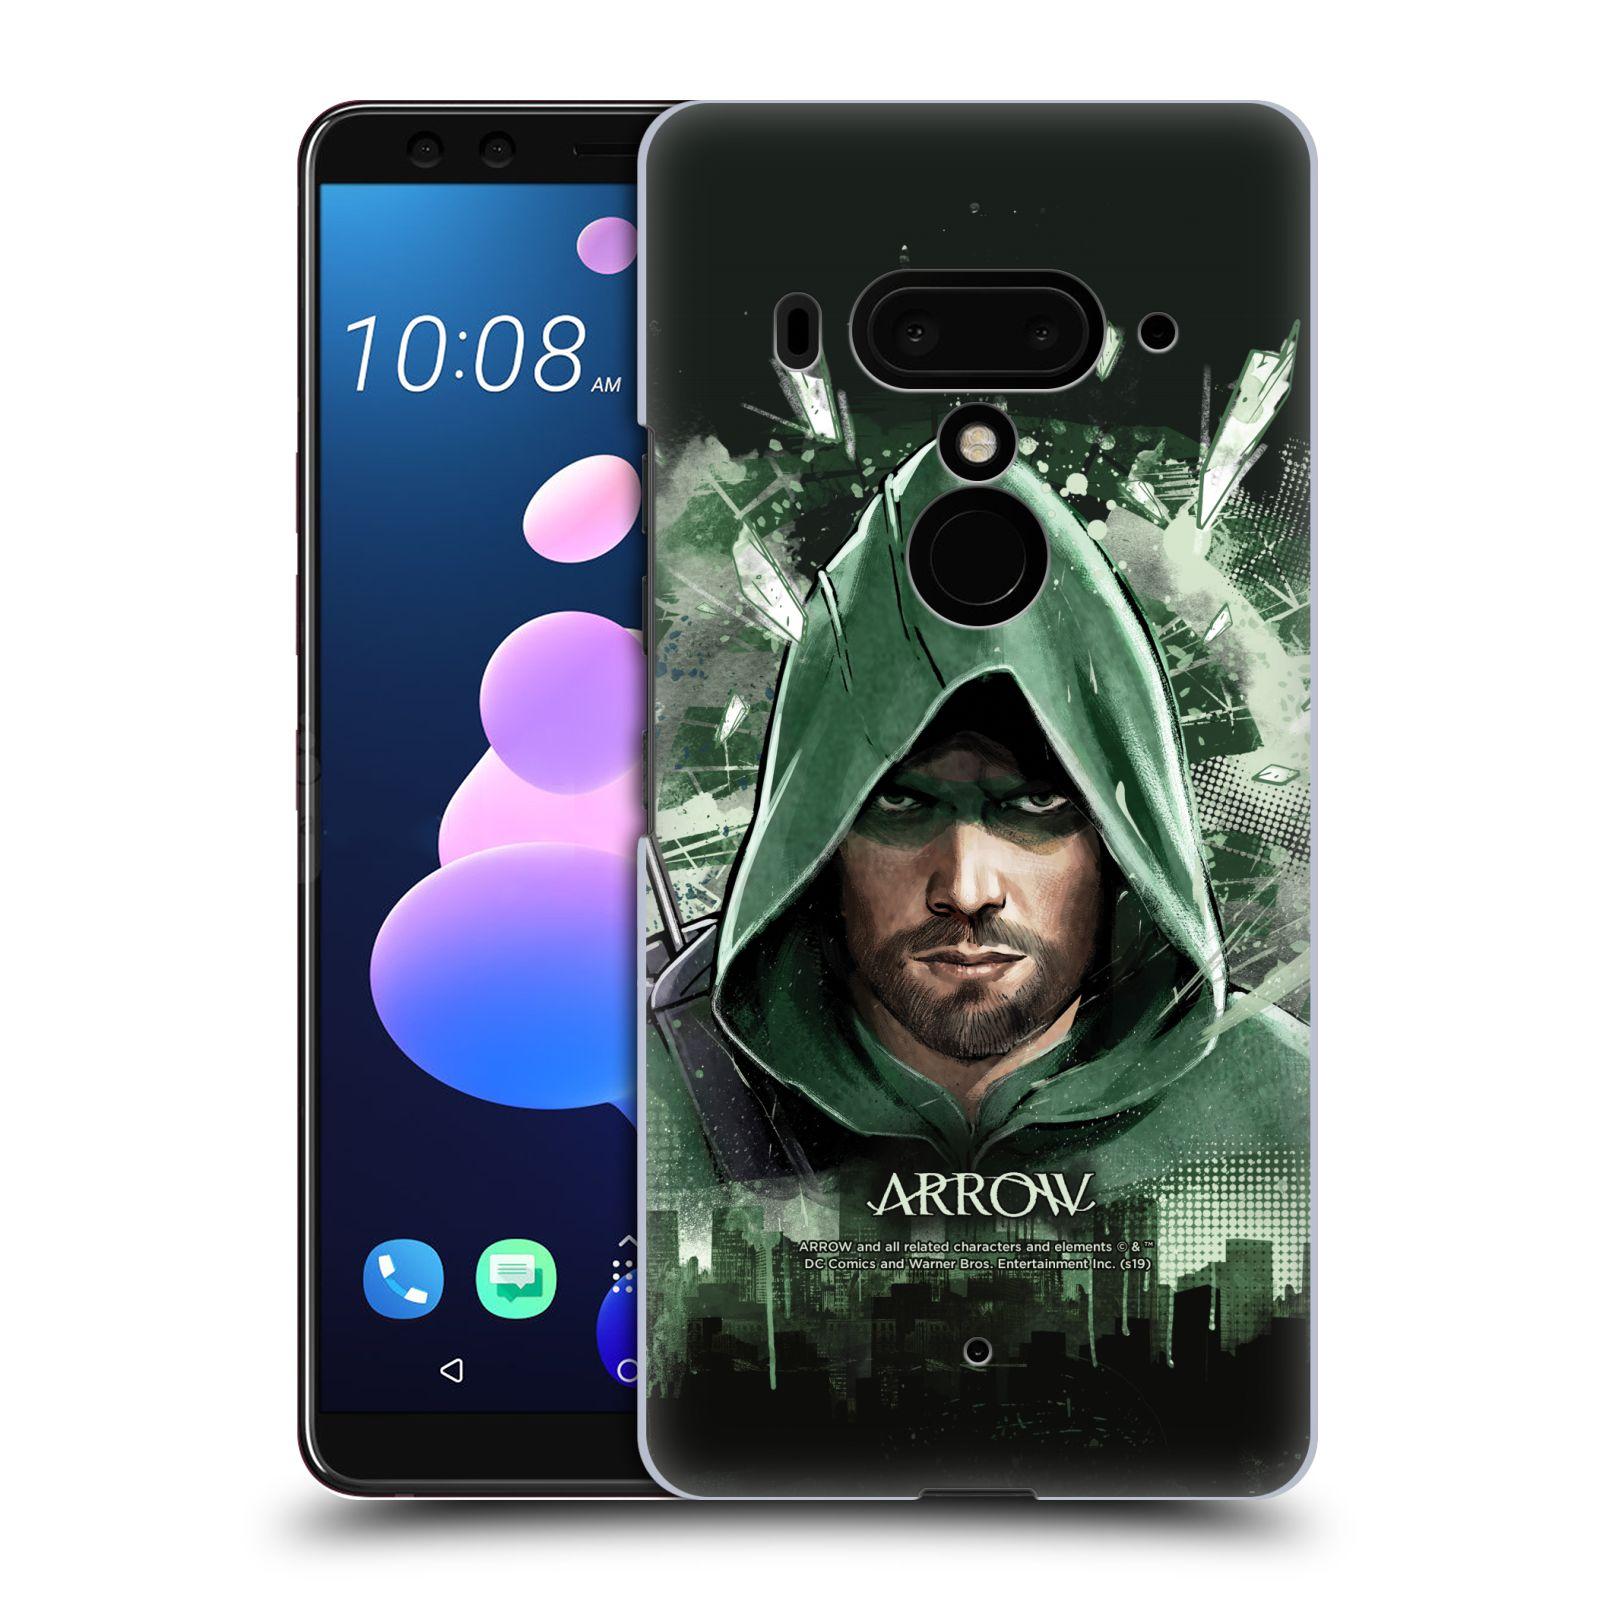 Pouzdro na mobil HTC U 12 PLUS / U 12+ DUAL SIM - HEAD CASE - Seriál Arrow - kreslený motiv